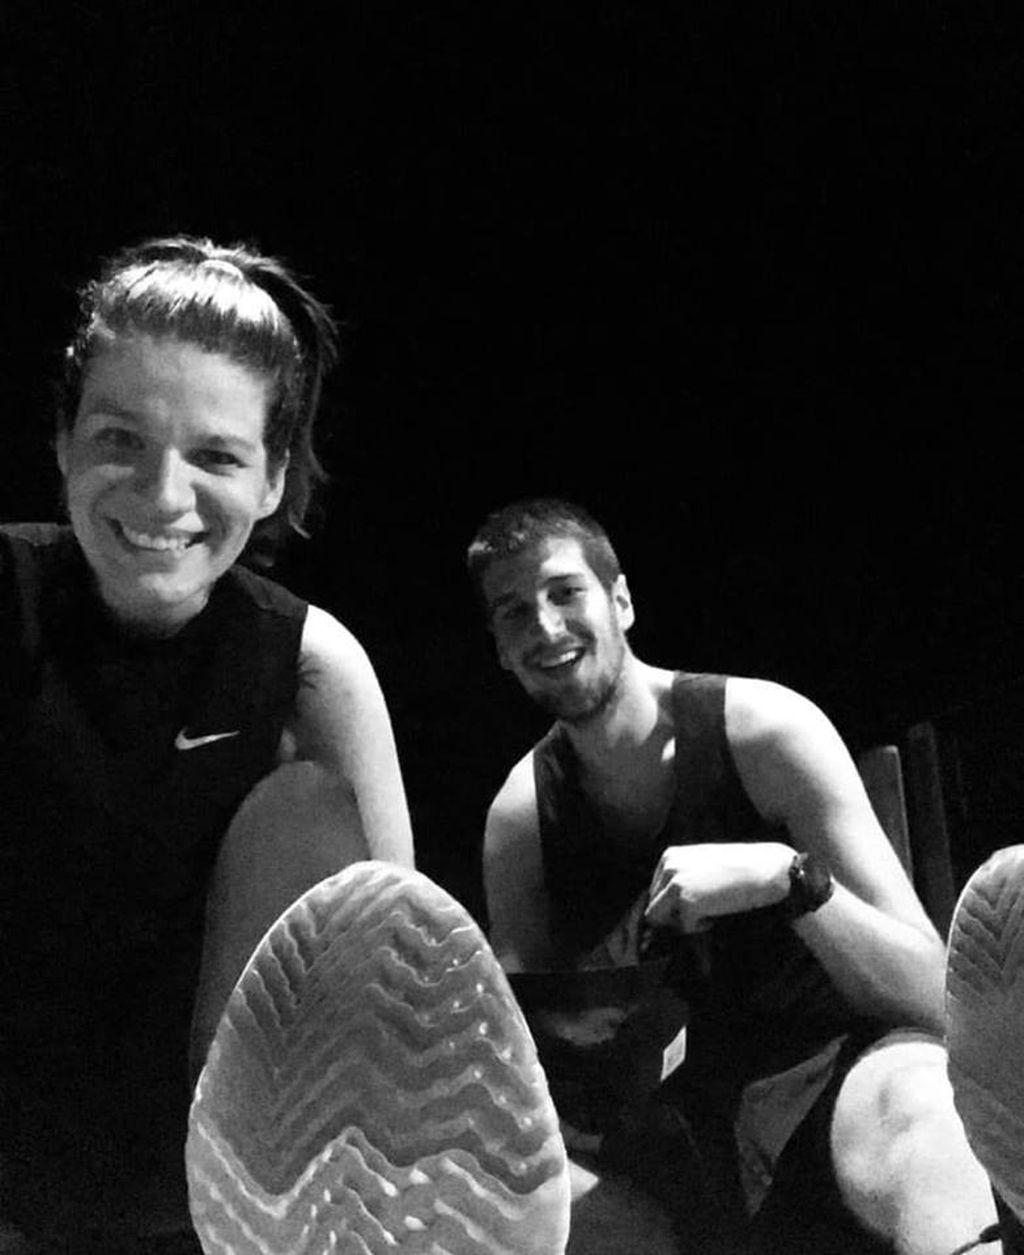 Prvi polumaraton istrčala sam s 31 godinom i s MS-om (Foto: Privatni album)